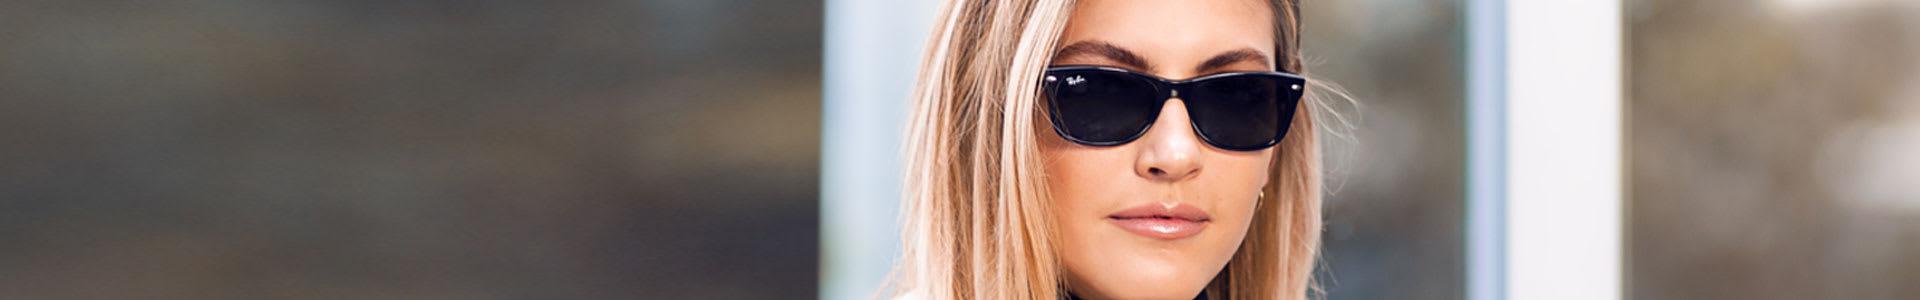 Ray-Ban Wafarer Sunglasses